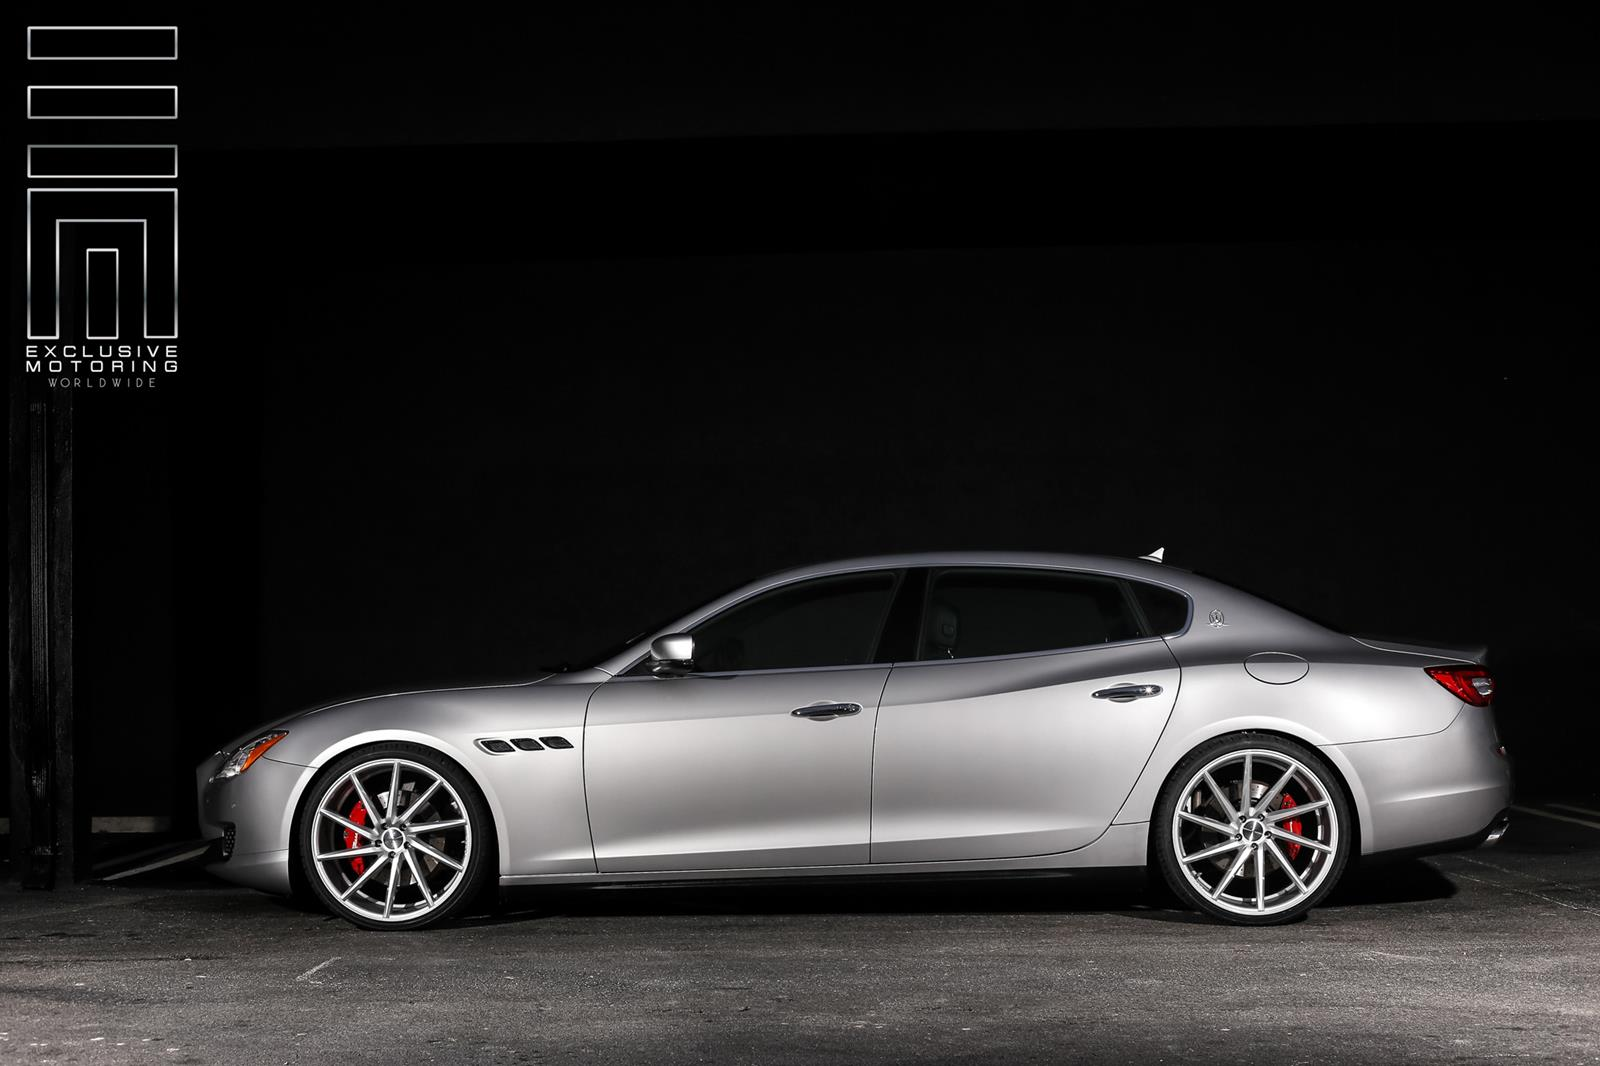 maserati quattroporte wheels lowered vossen important custom why q4 silver proves right metallic autoevolution cvt gray cars tuning carscoops